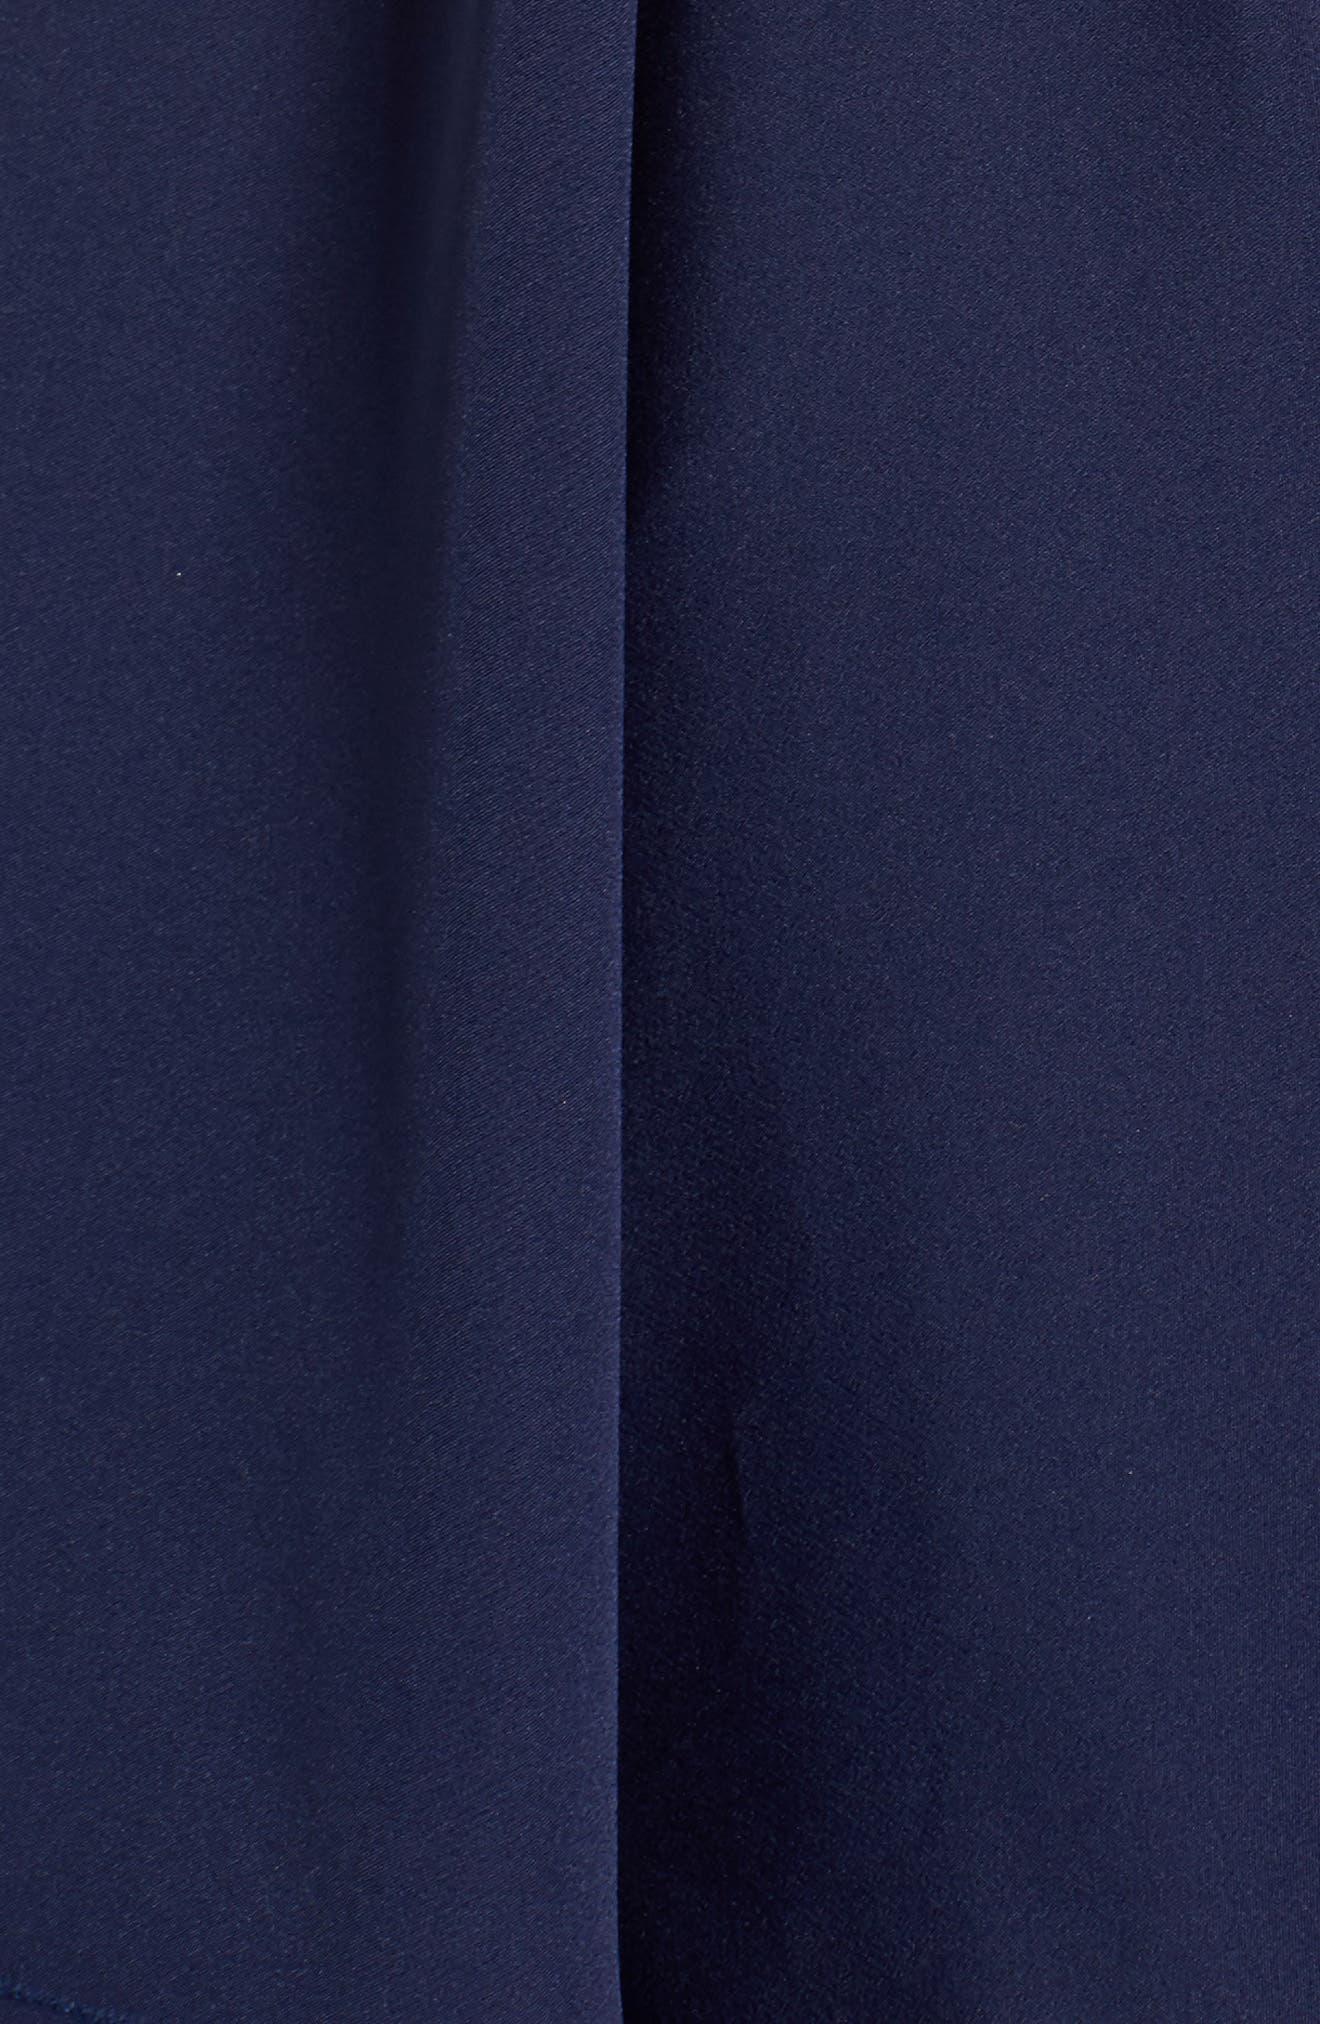 Beaded Illusion Neck Skater Dress,                             Alternate thumbnail 6, color,                             Midnight